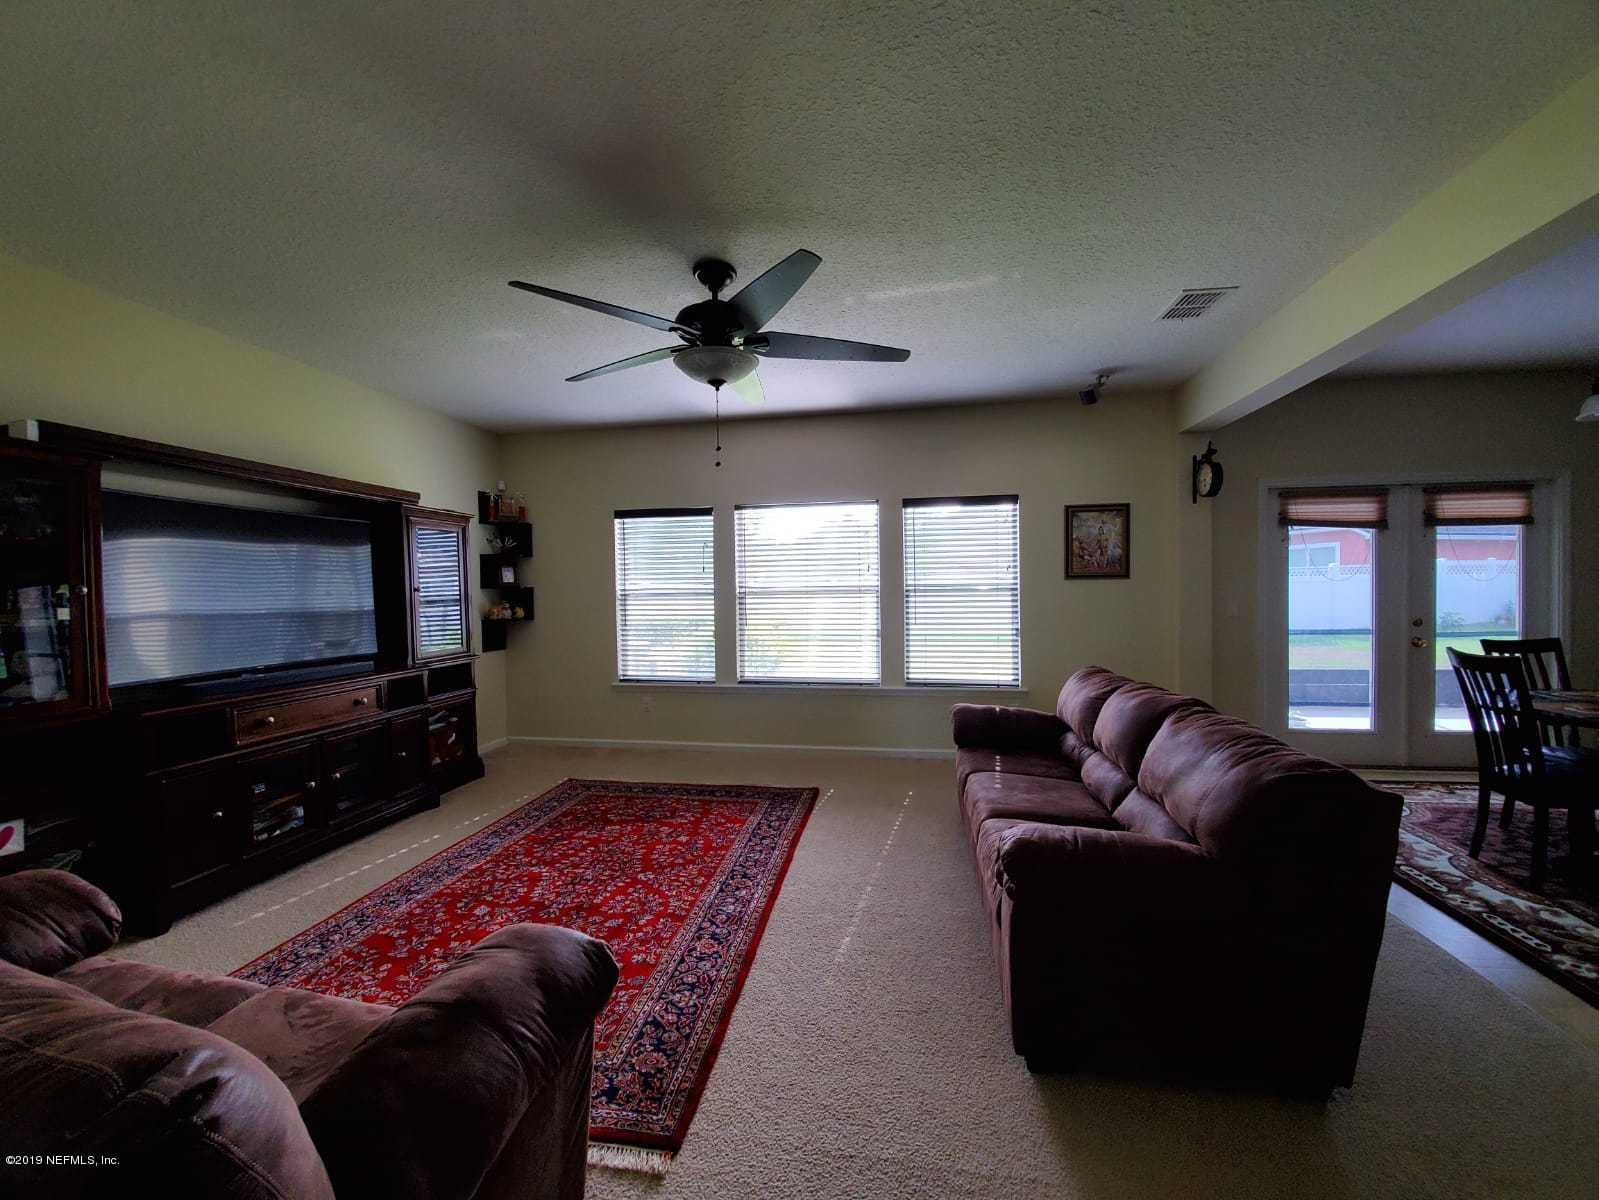 109 BURGHEAD, ST JOHNS, FLORIDA 32259, 5 Bedrooms Bedrooms, ,3 BathroomsBathrooms,Rental,For Rent,BURGHEAD,1056228